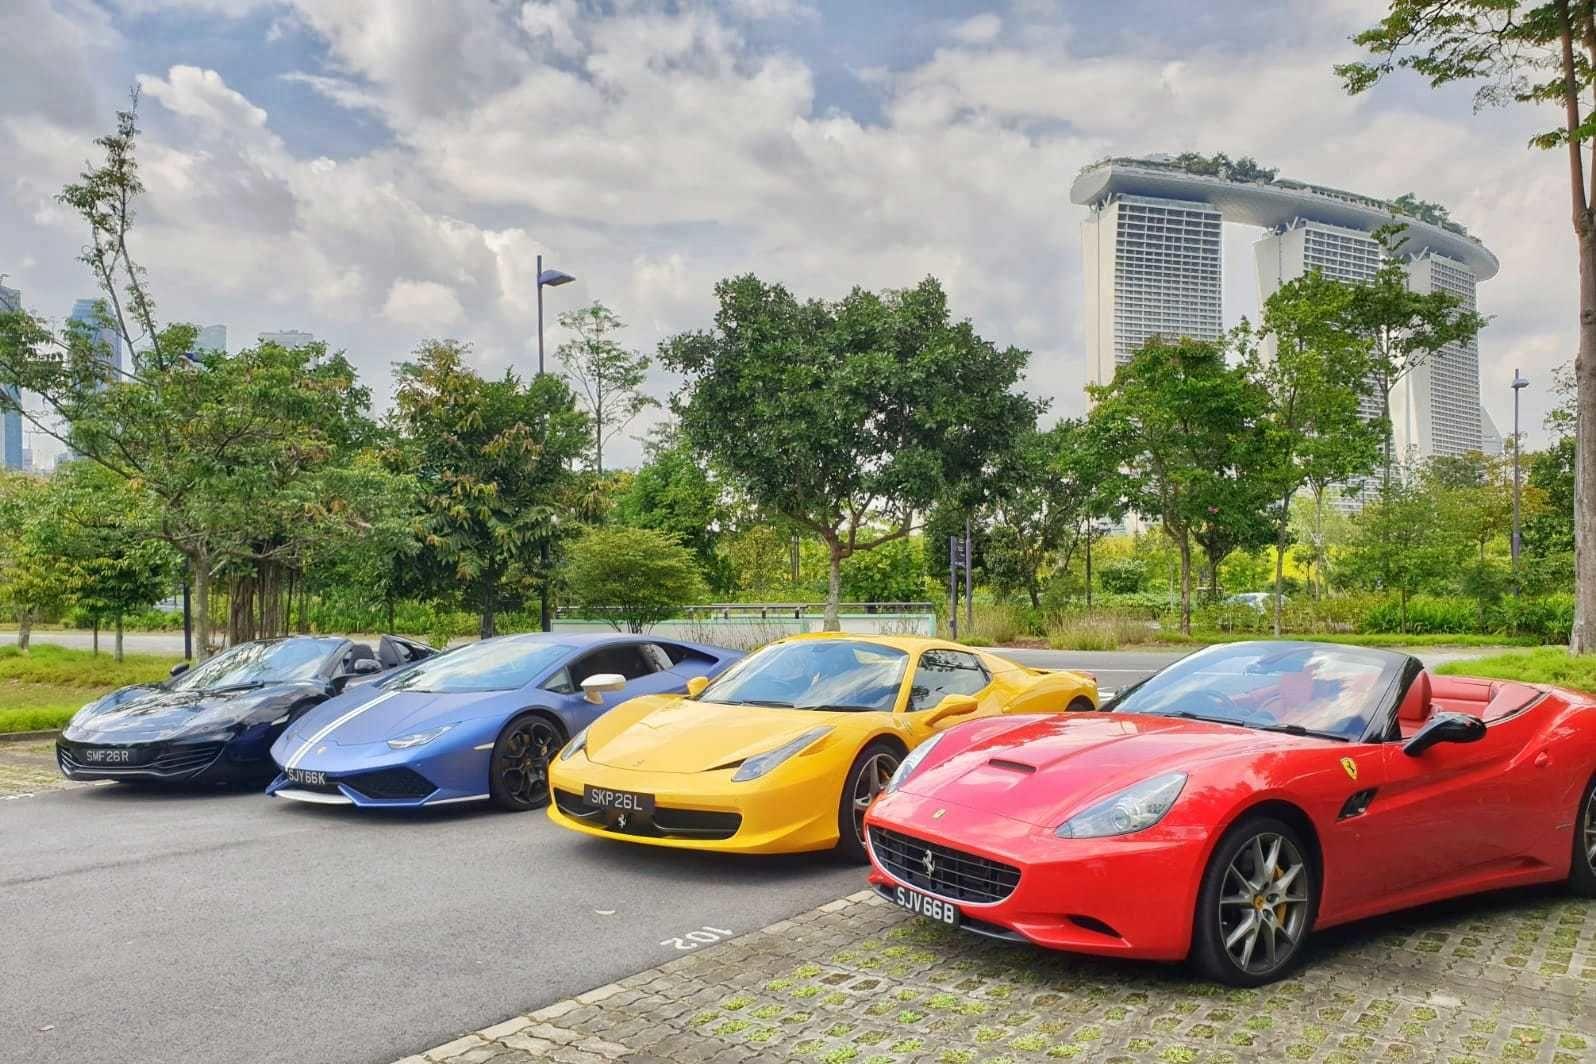 4supercars.jpeg